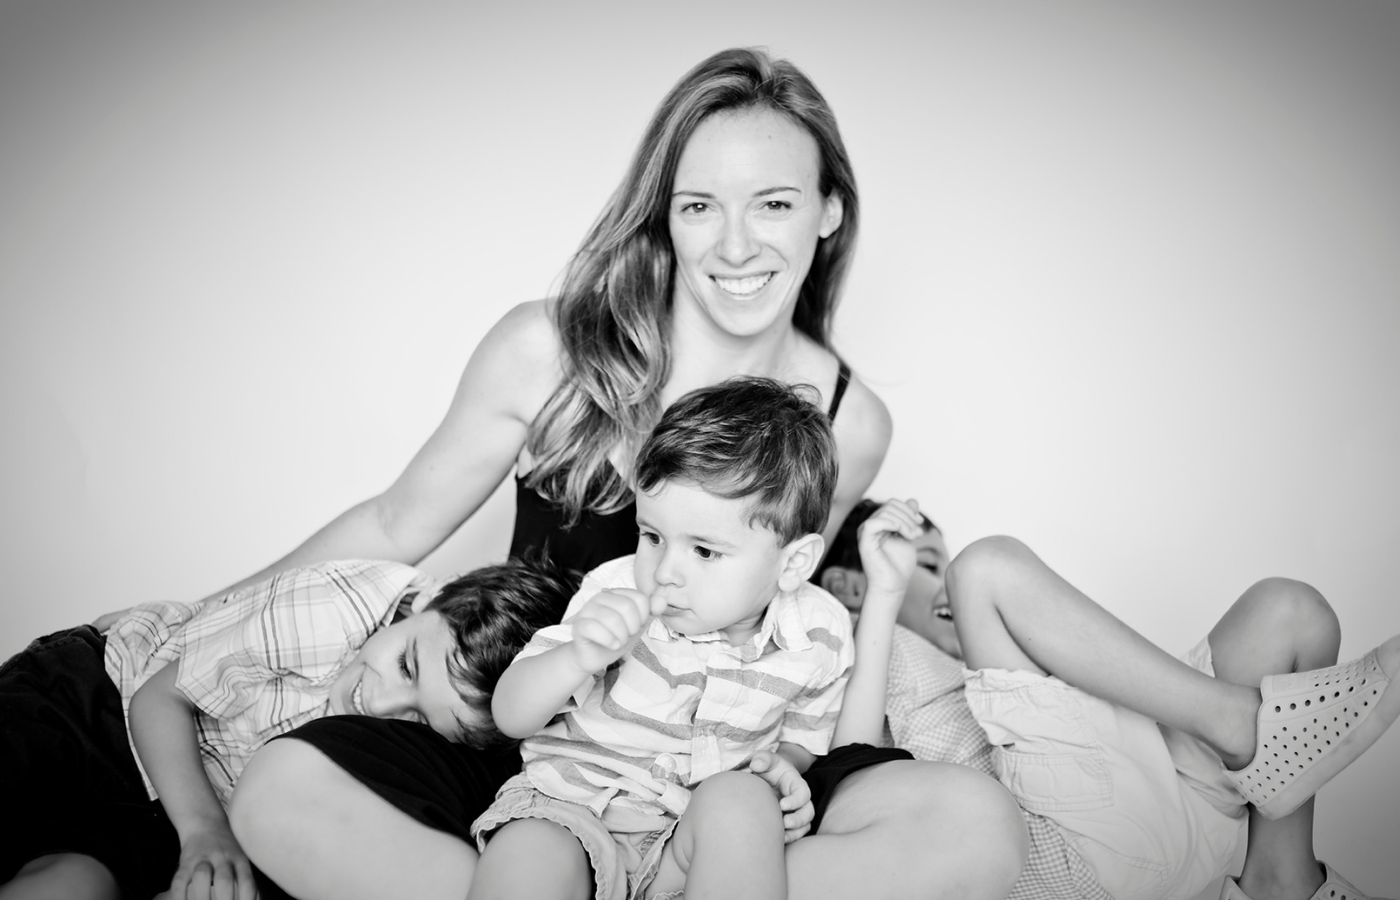 Jessica & Her Boys / Photo: Skylar Reeves